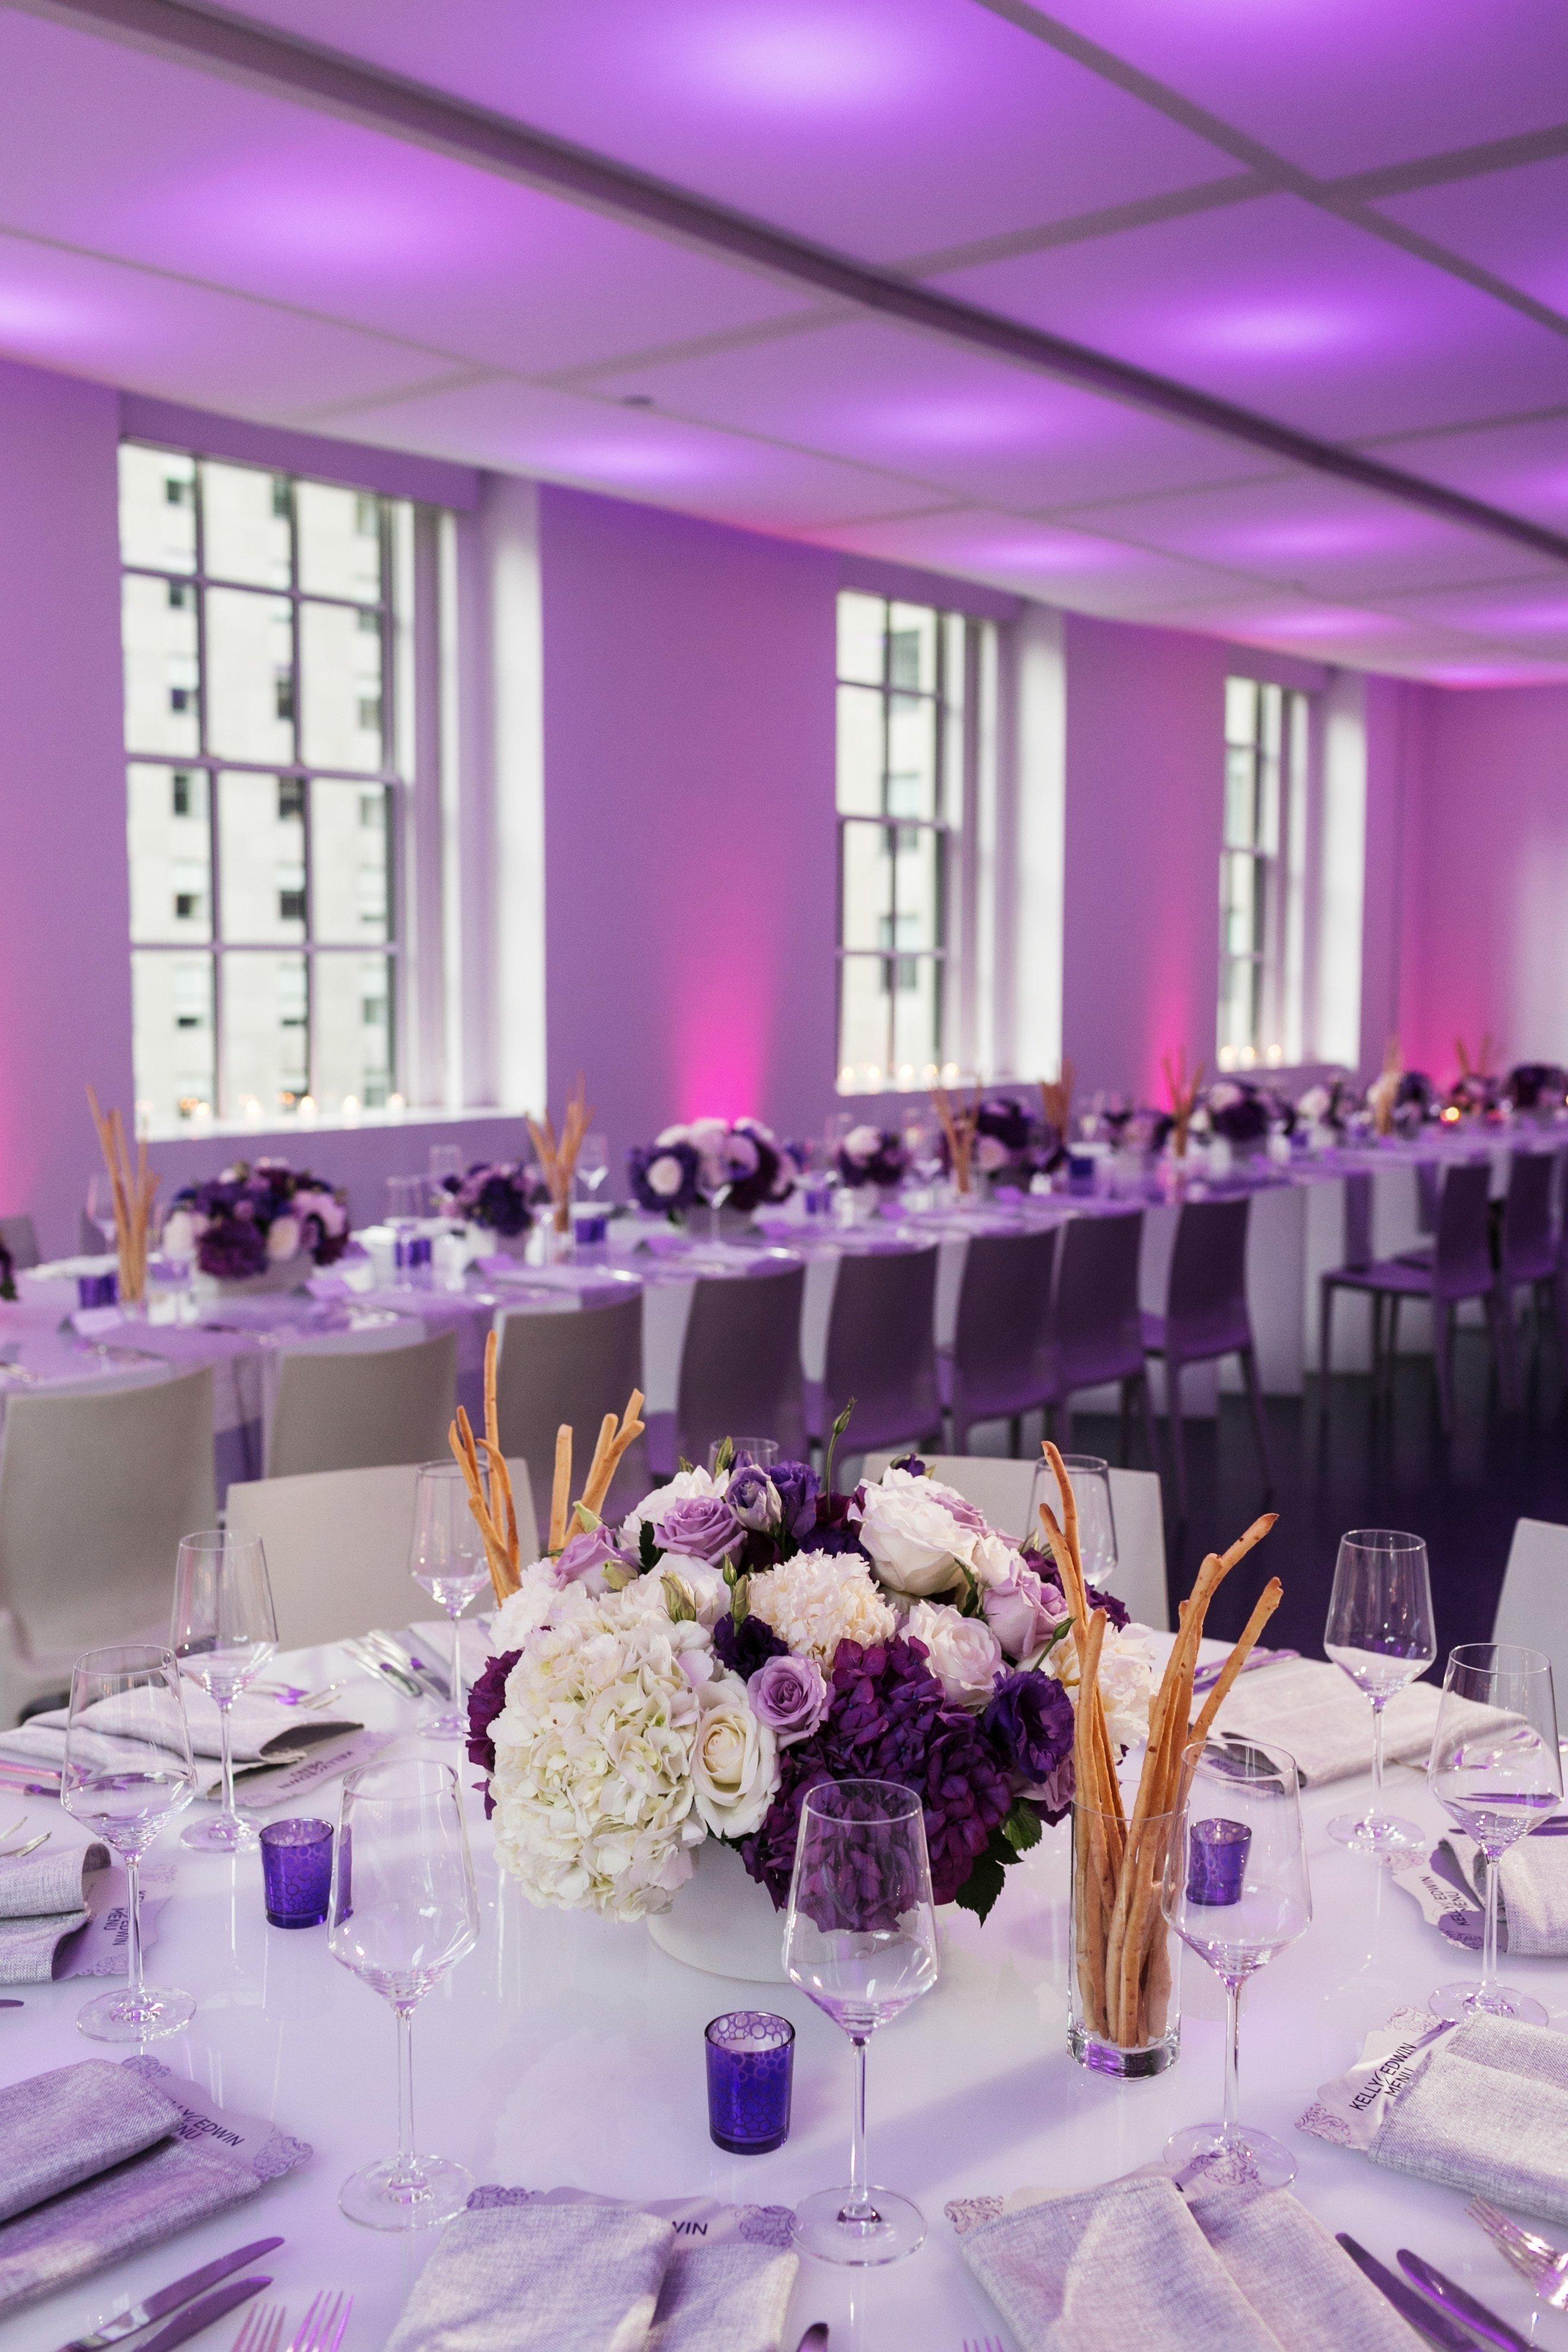 10 Trendy Purple And White Wedding Ideas purple and white wedding reception decor centerpieces 50th 2021